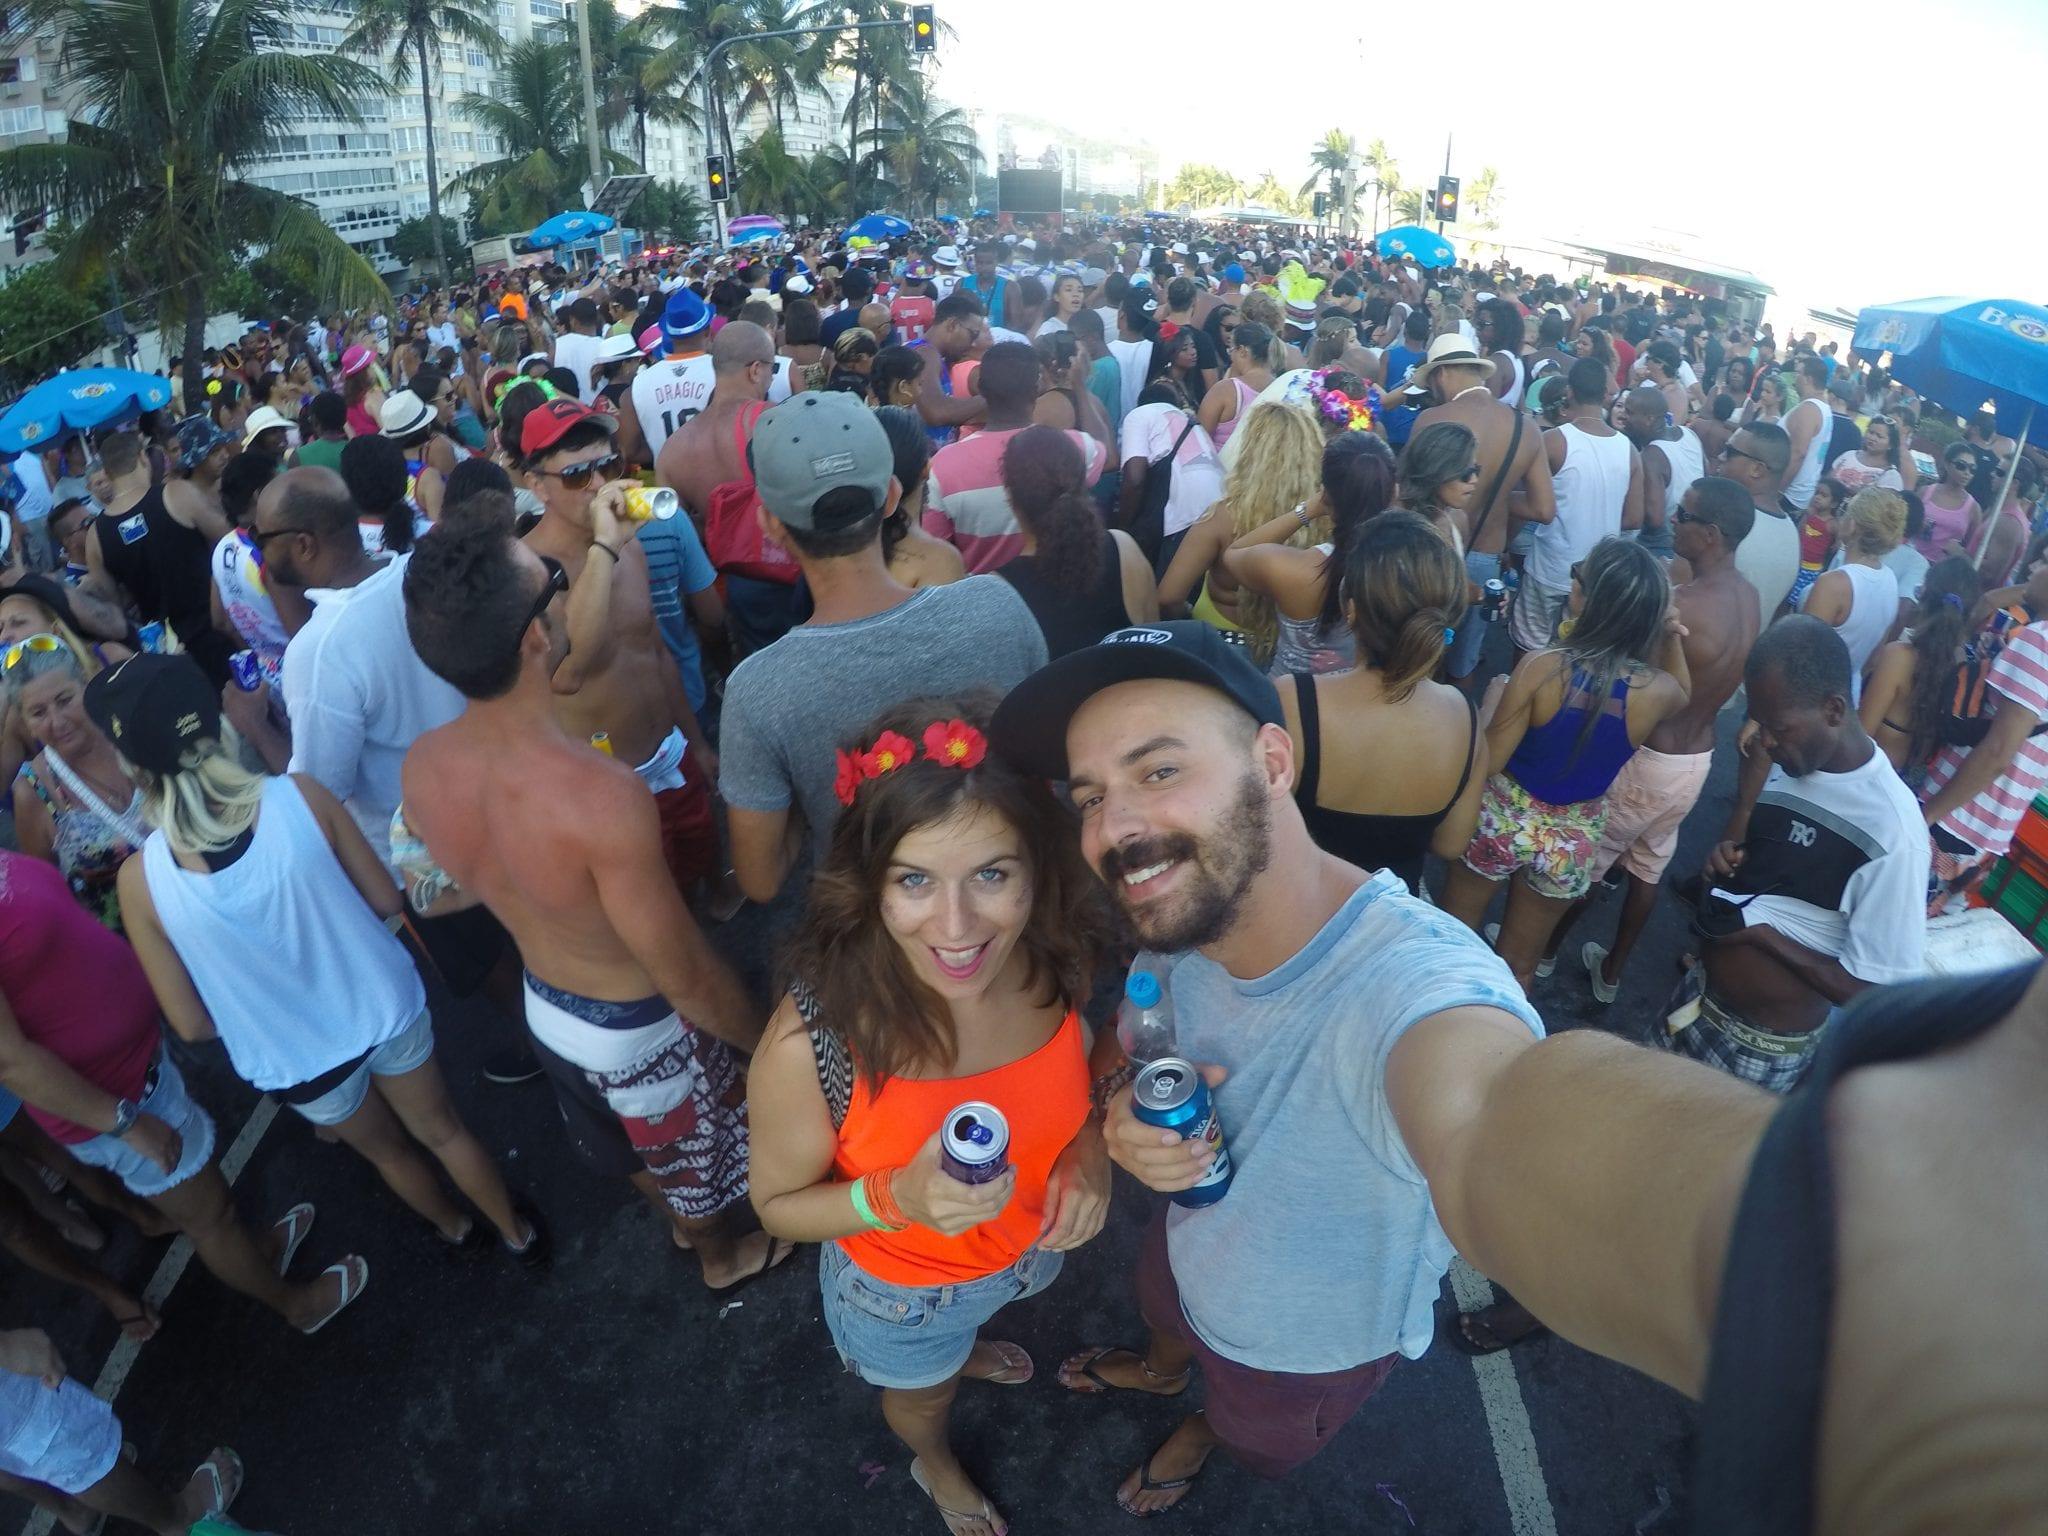 bloco selfie at rio carnival